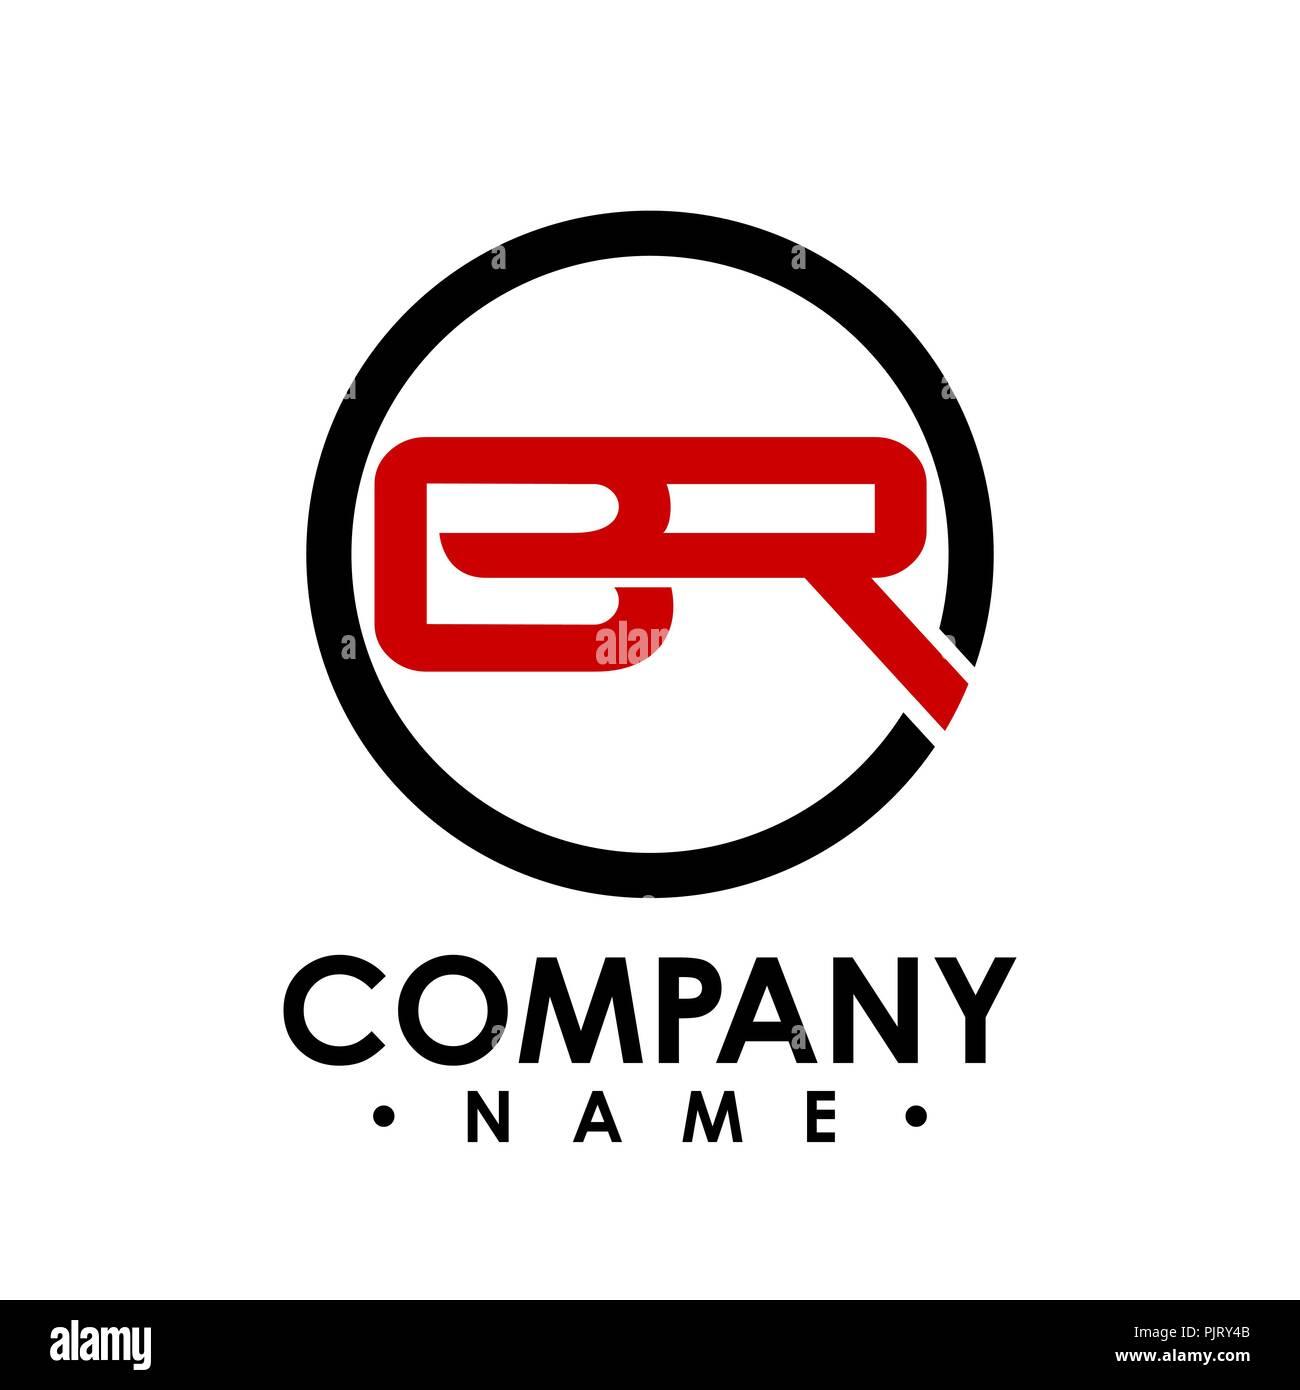 br letter with circle shape logo design vector illustration template b letter logo vector letter b and r logo vector creative letter br letter logo